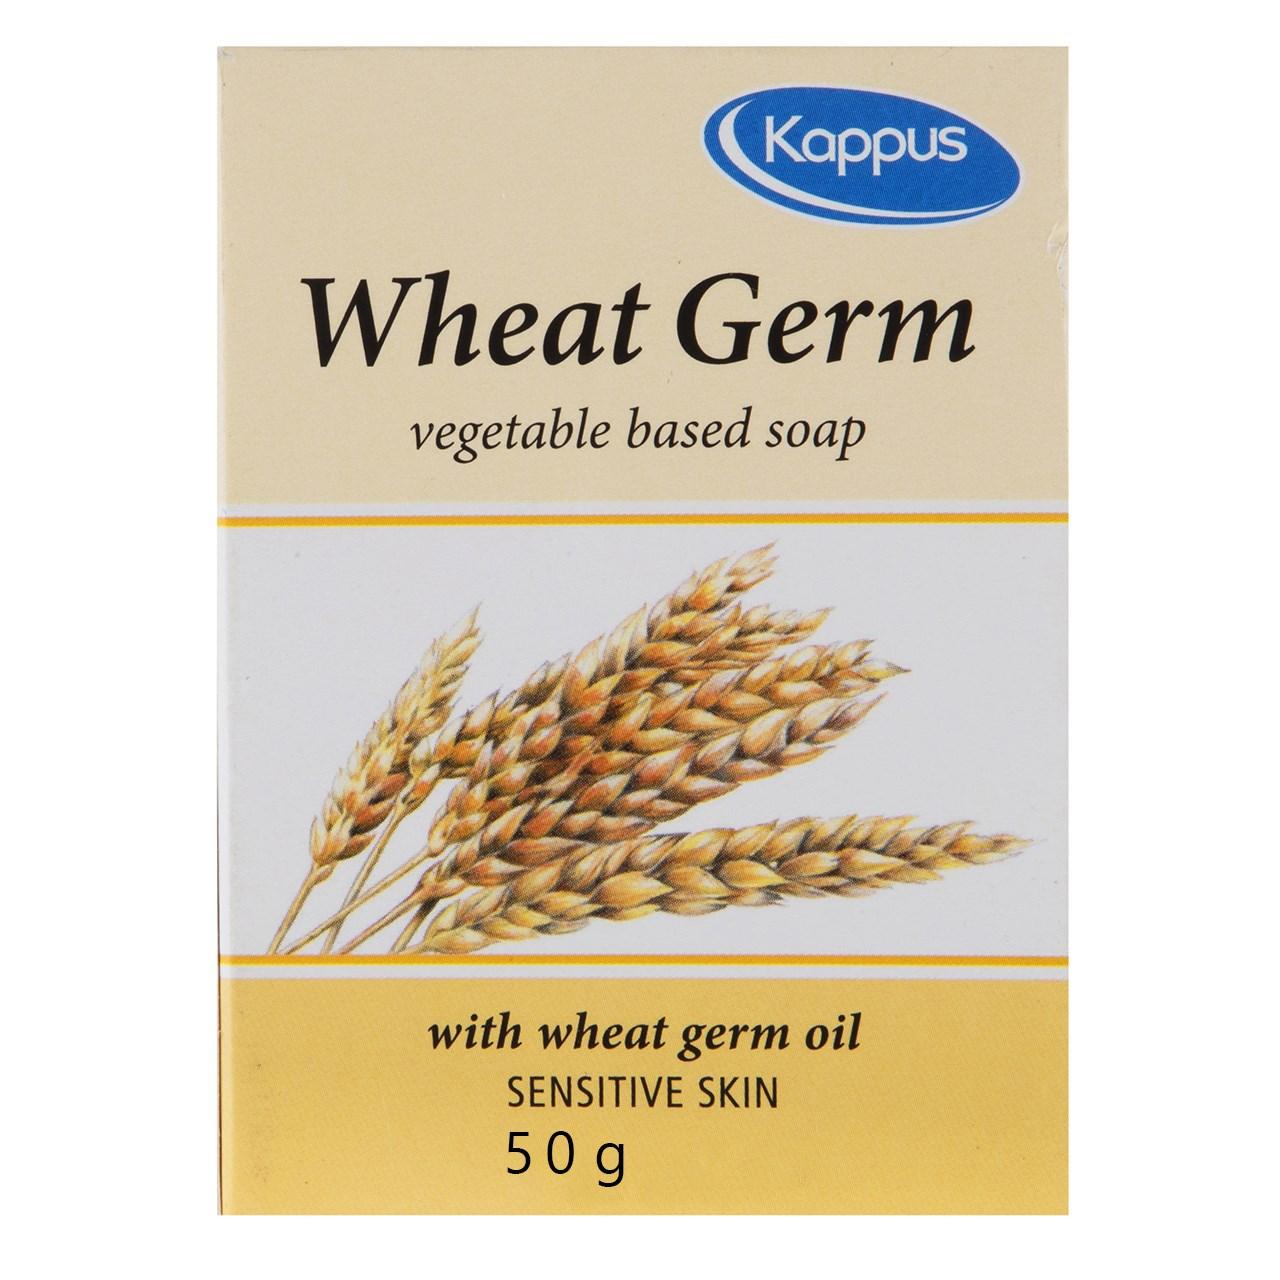 قیمت صابون کاپوس مدل Wheat Germ مقدار 50 گرم